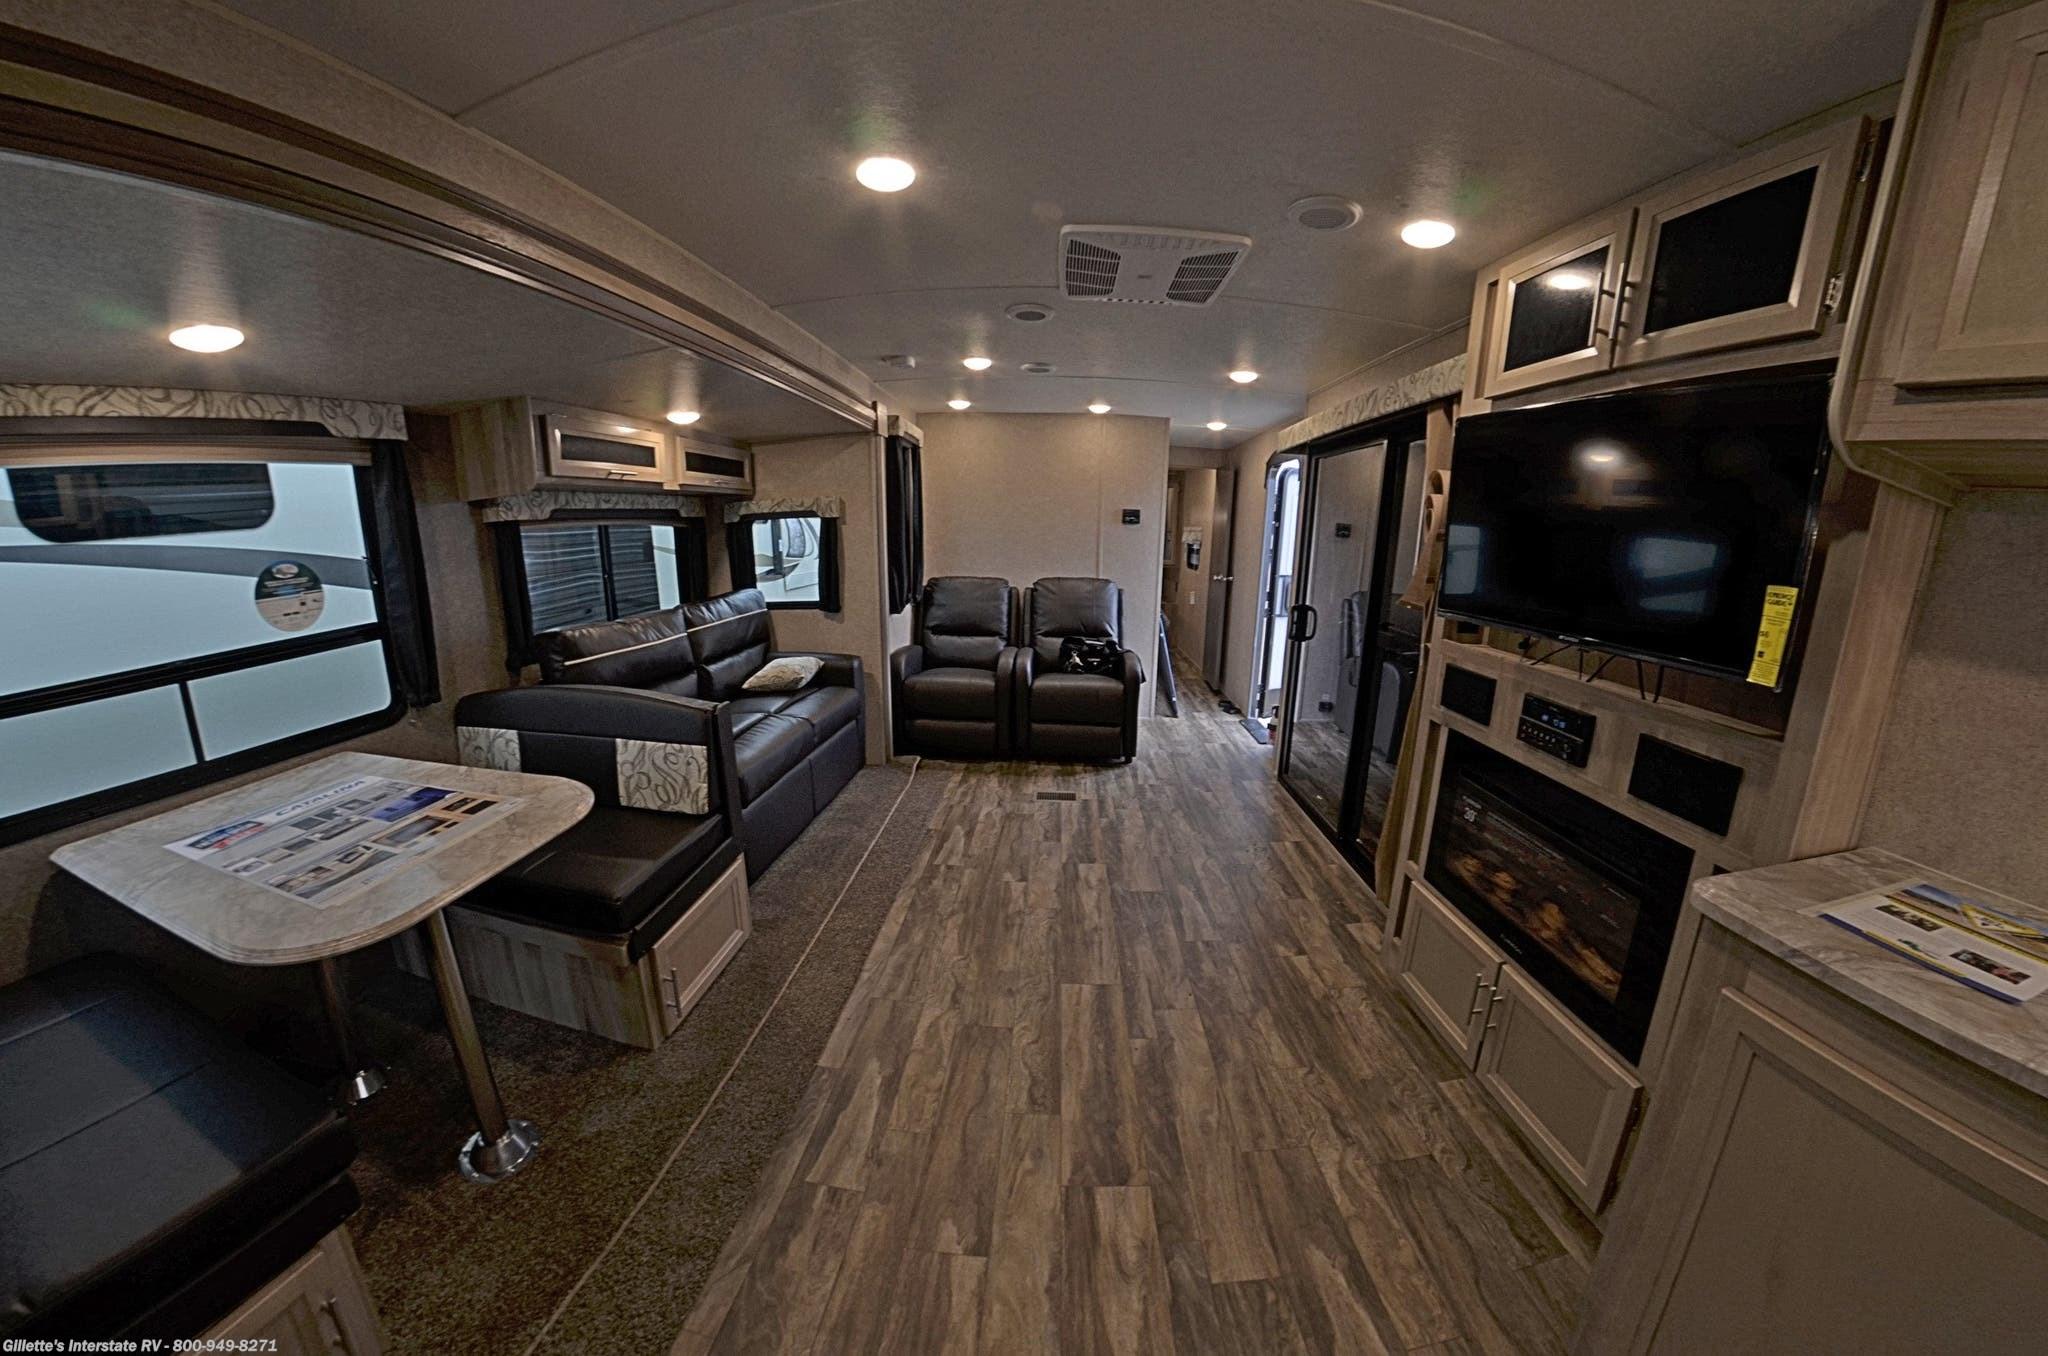 2019 Coachmen Rv Catalina Legacy Edition 303rkp For Sale